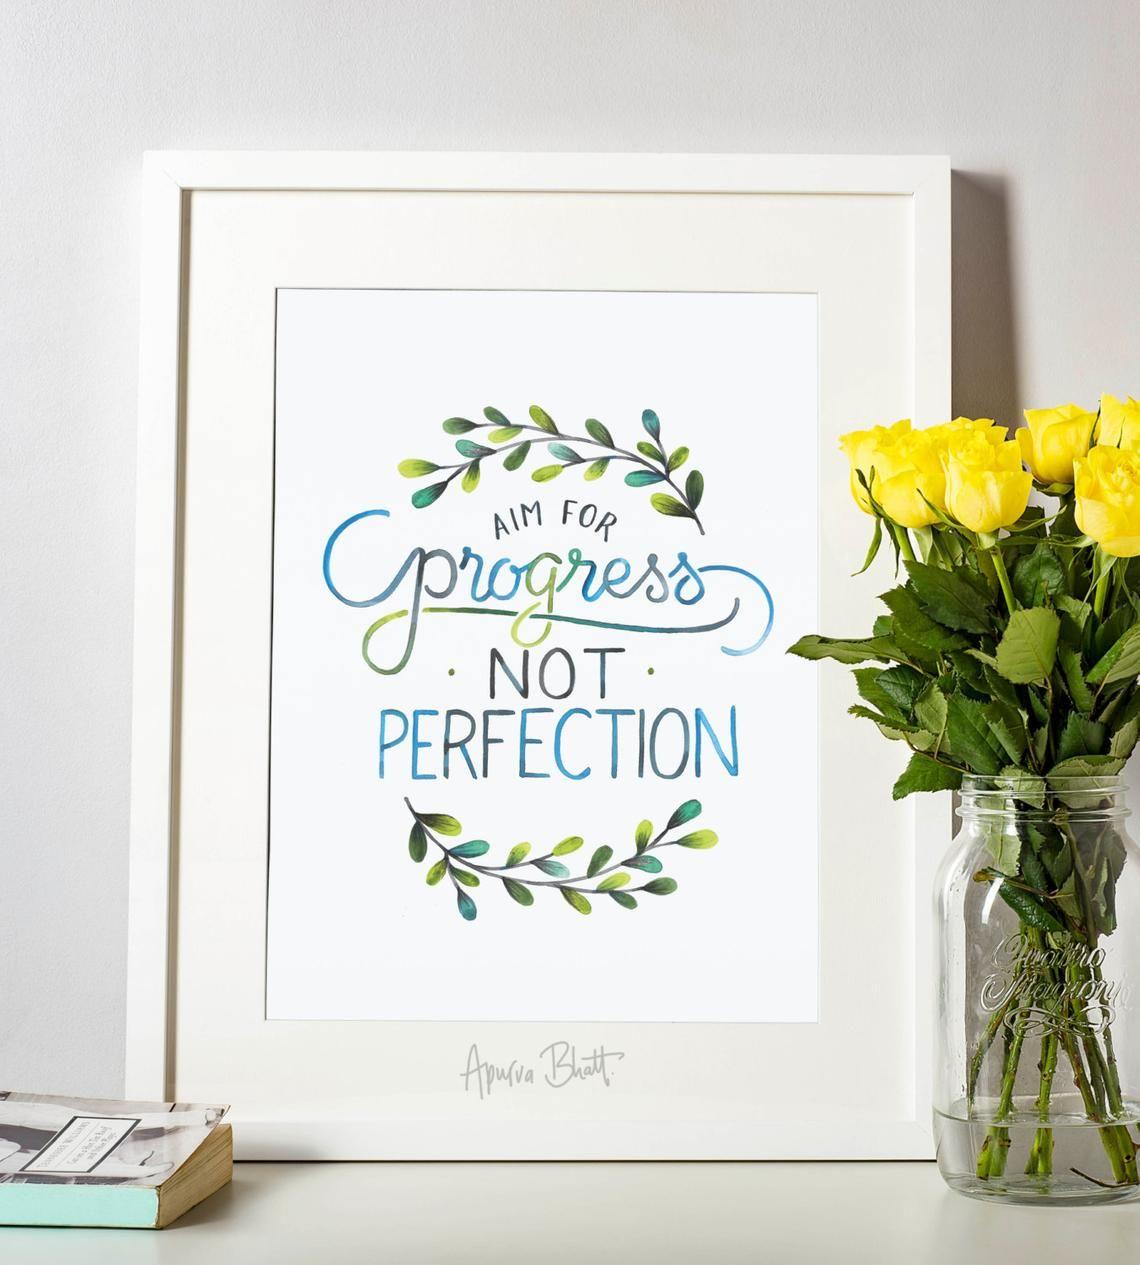 Aim for progress not perfection etsy progress not